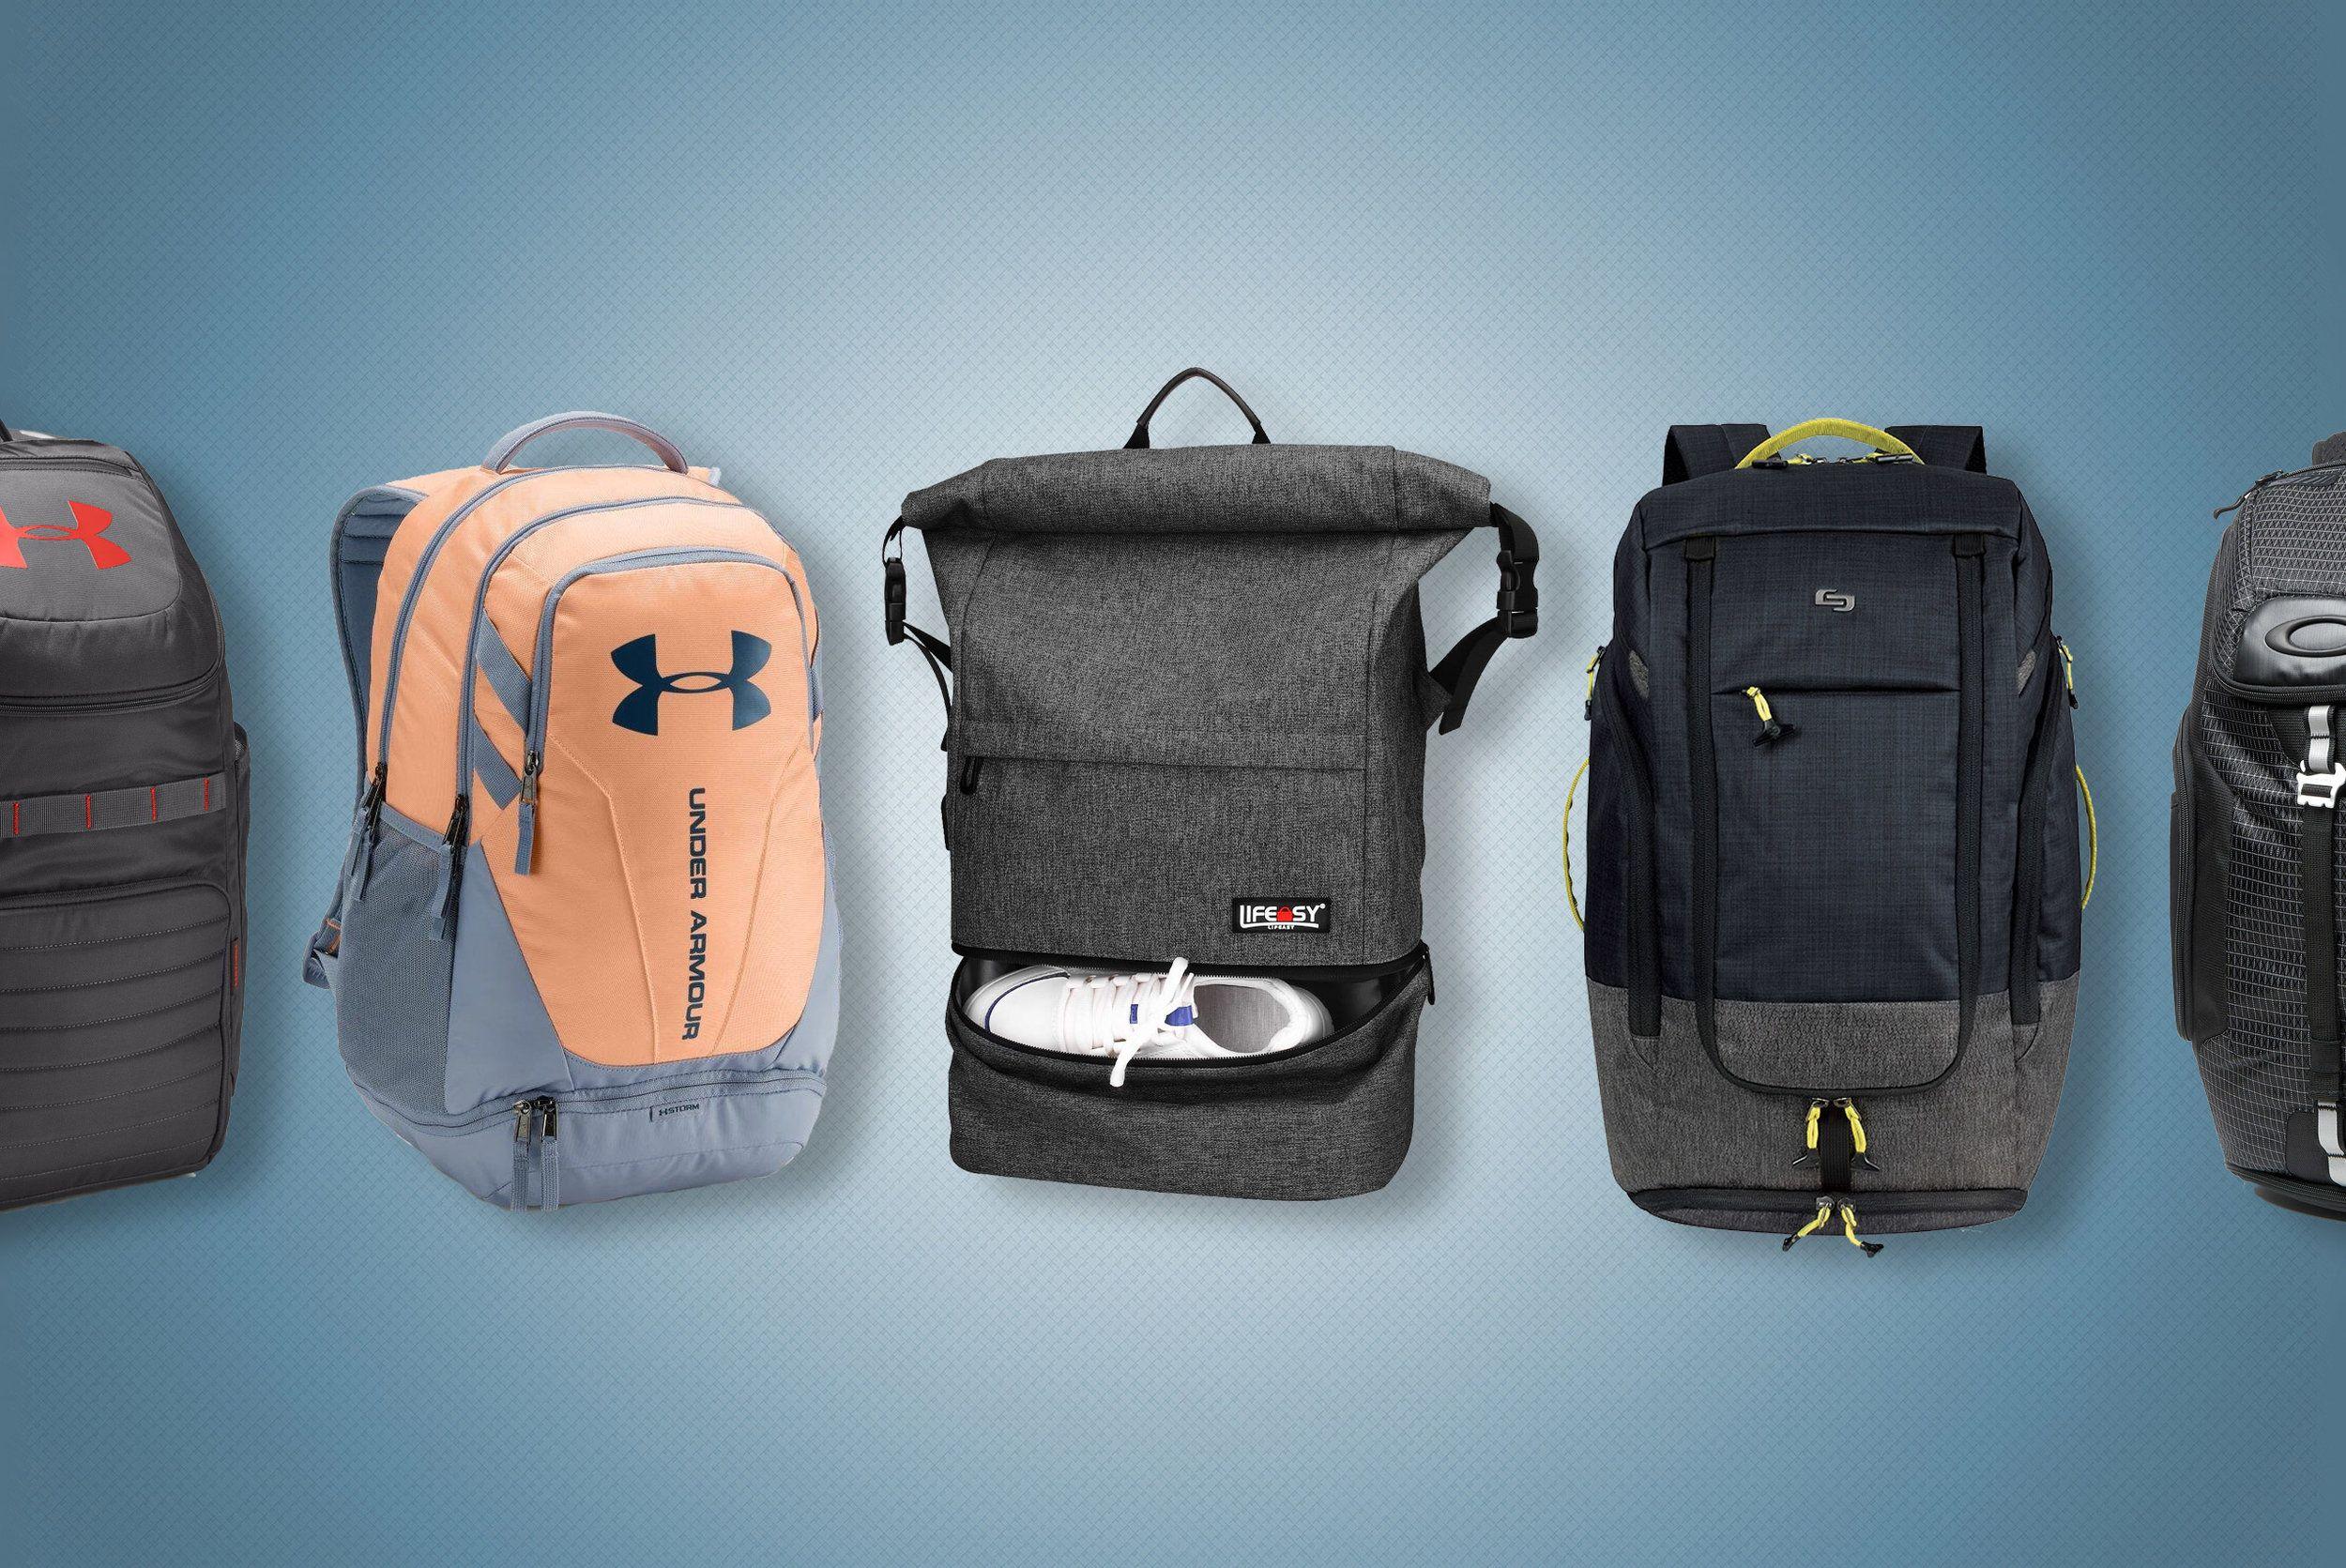 10 Best Women S Backpacks For Work That Are Sophisticated And Smart Mens Backpacks For Work Men S Backpack Stylish Backpacks